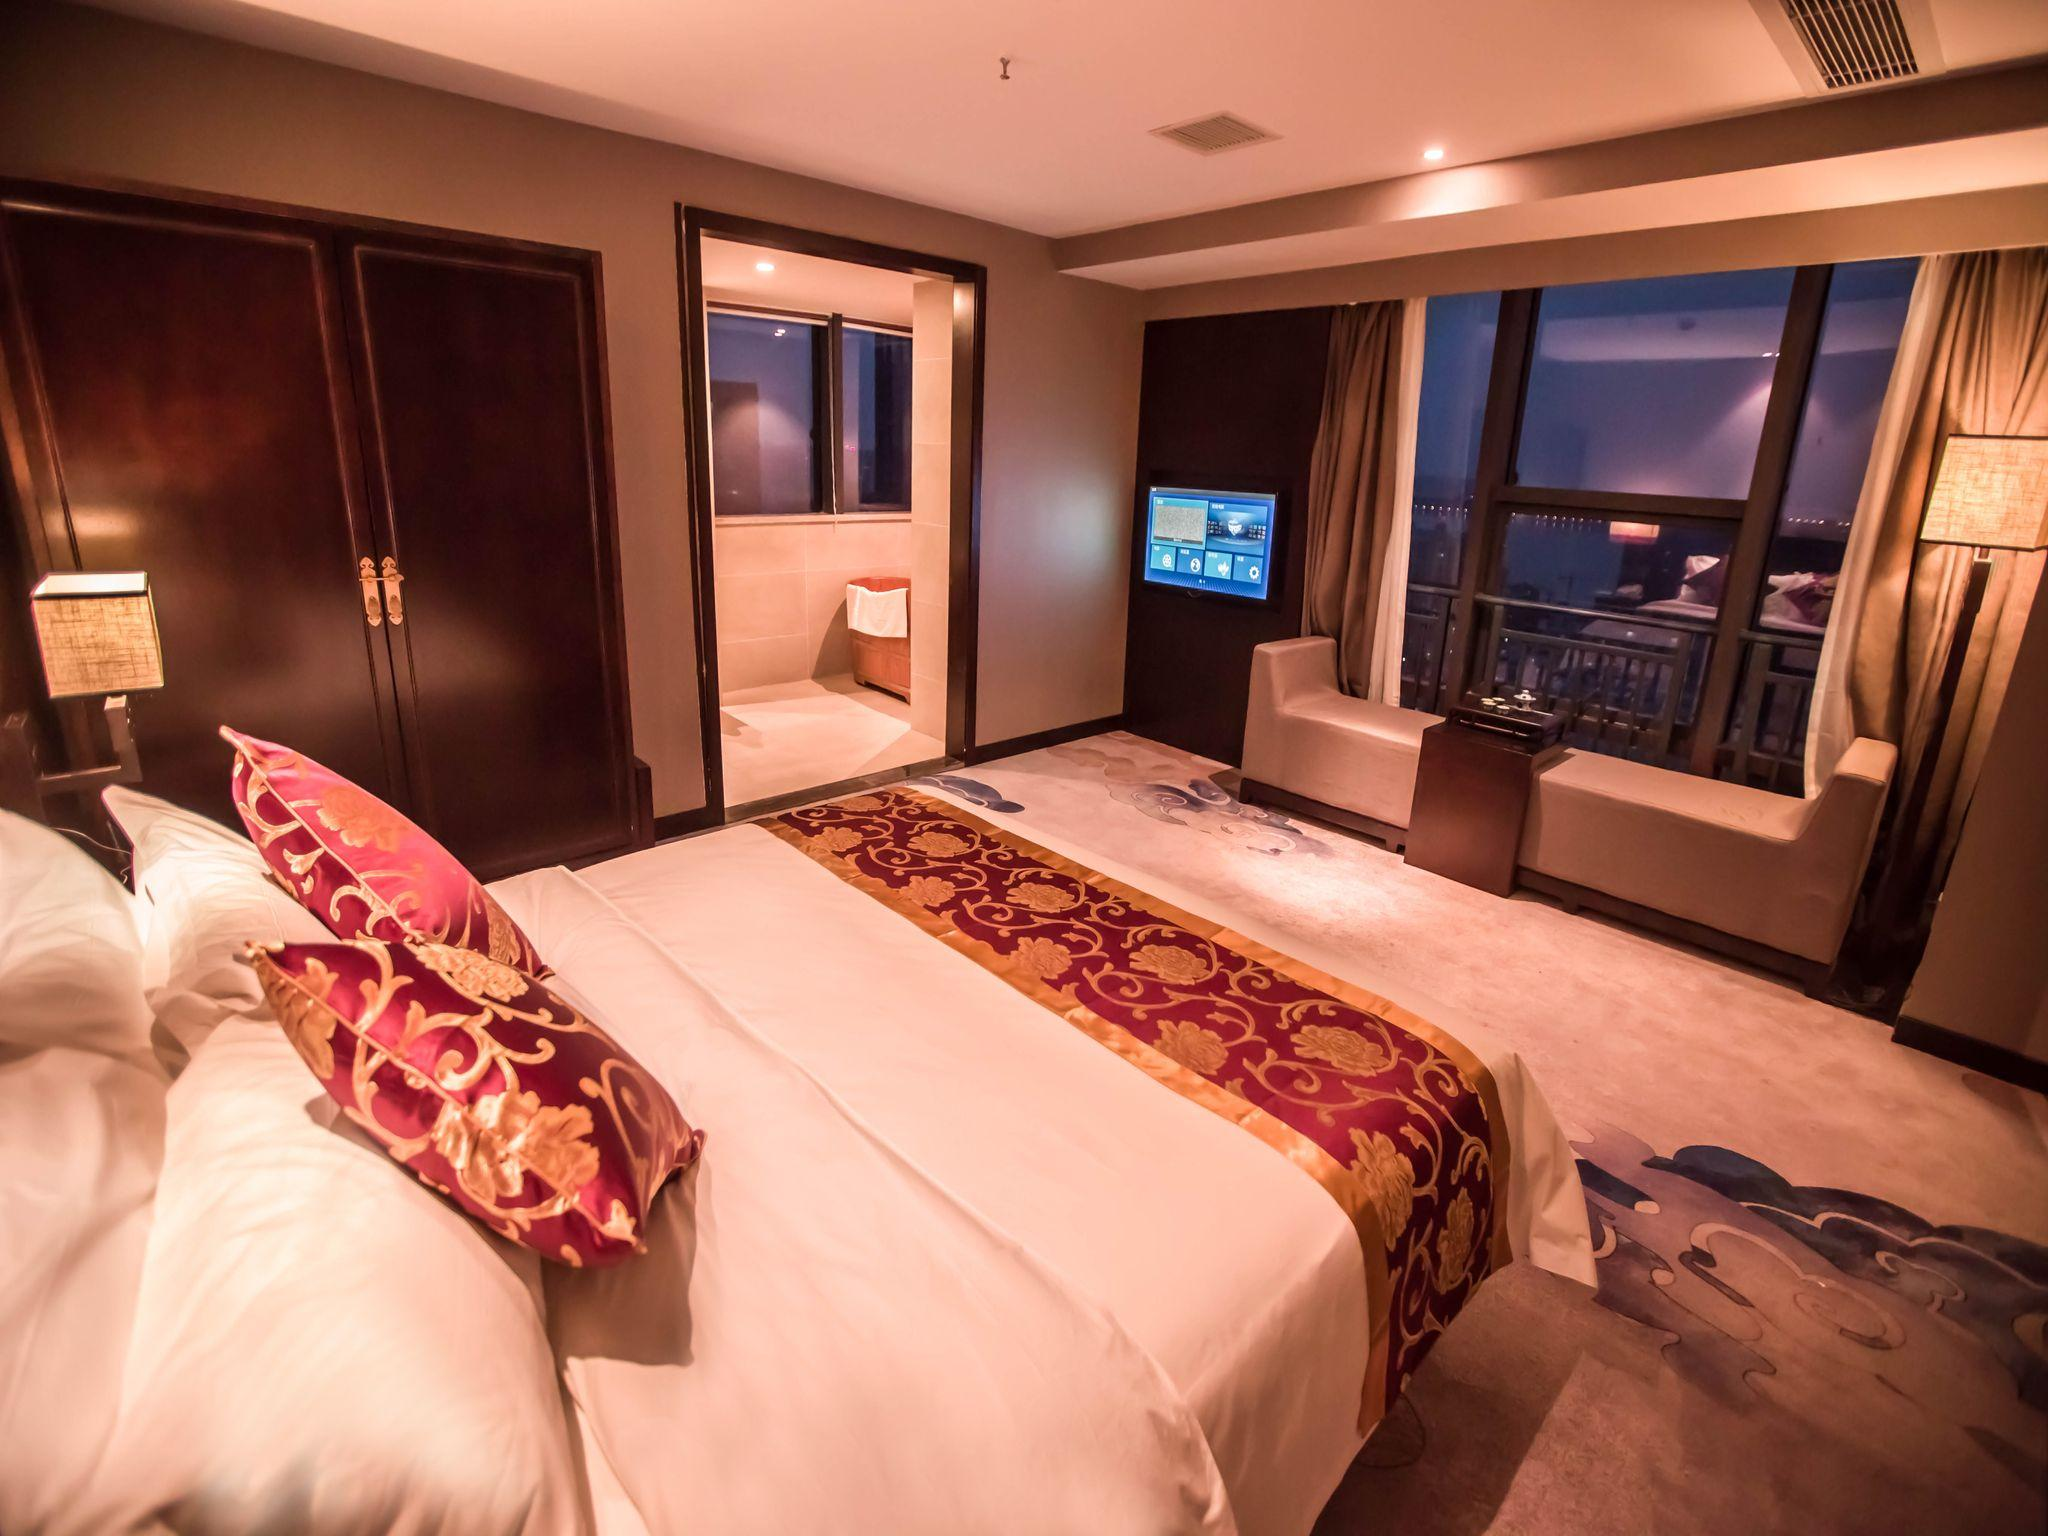 New Beacon Chuyu Hotel